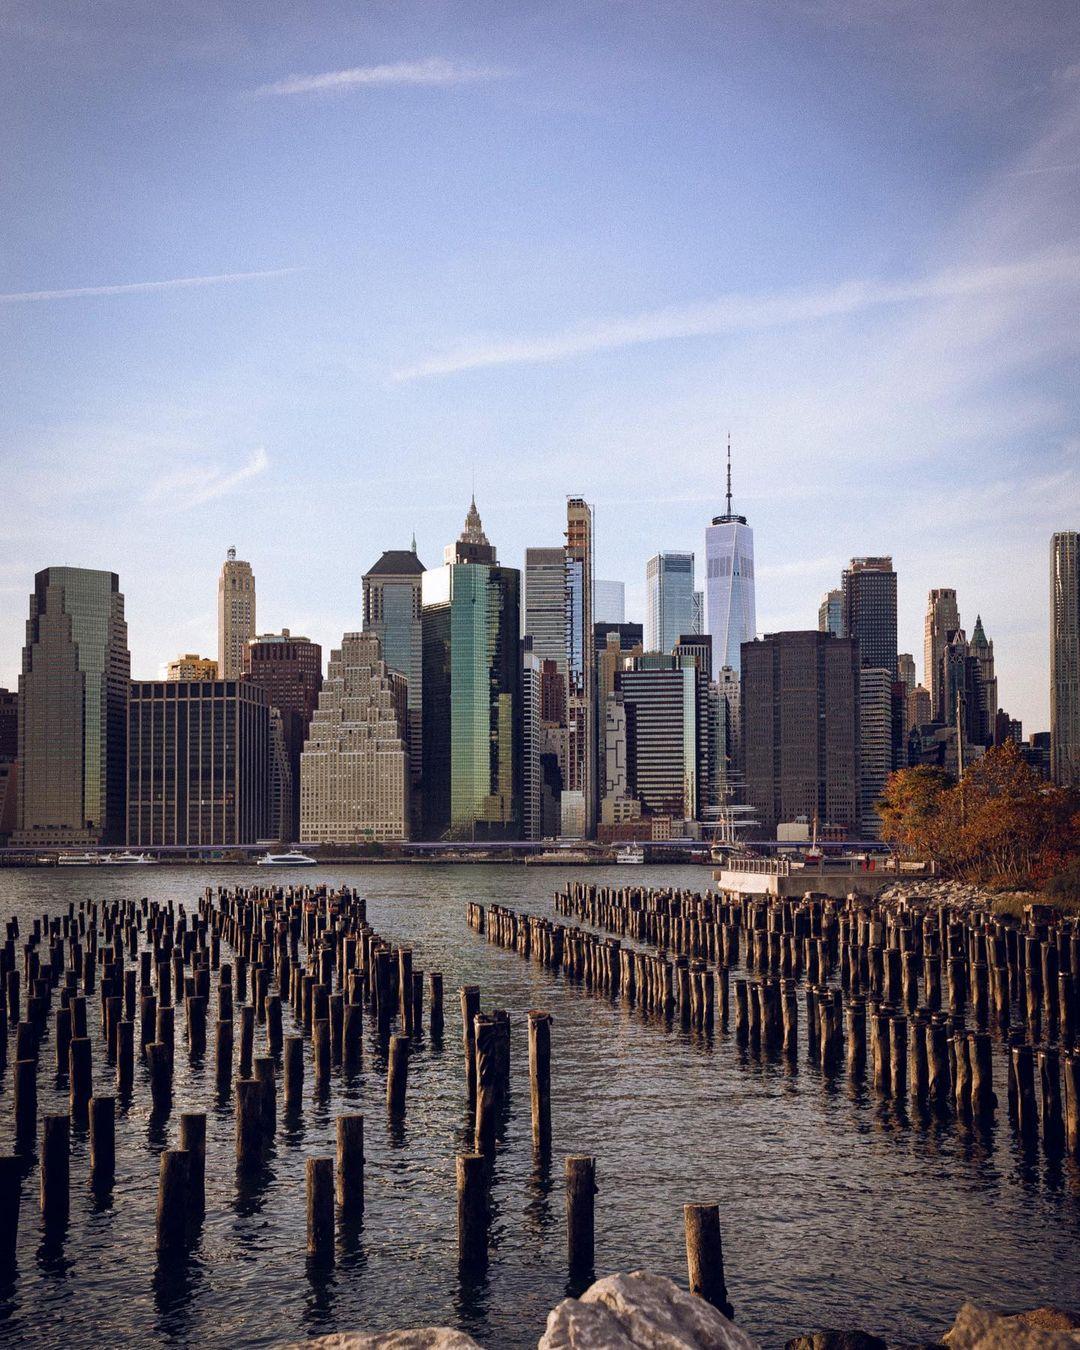 StreetEasyFinds NYC skyline shot from Brooklyn